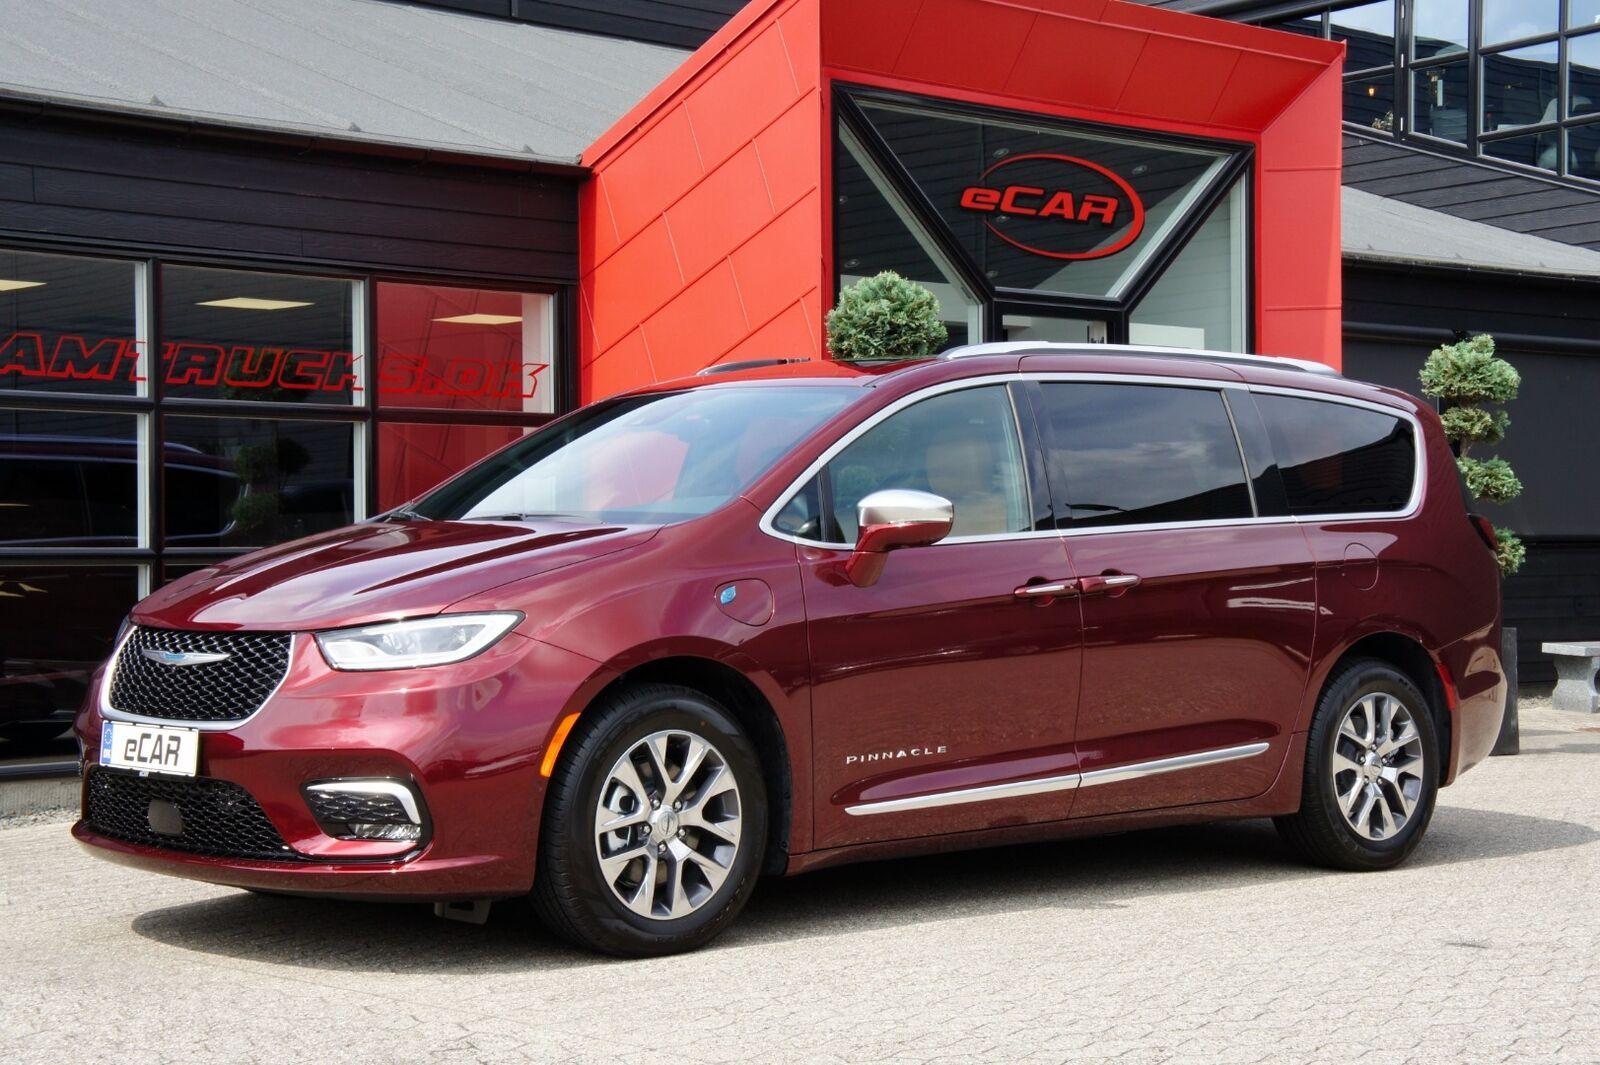 Chrysler Pacifica 3,6 Hybrid Limited Pinnacle aut. 5d - 929.800 kr.